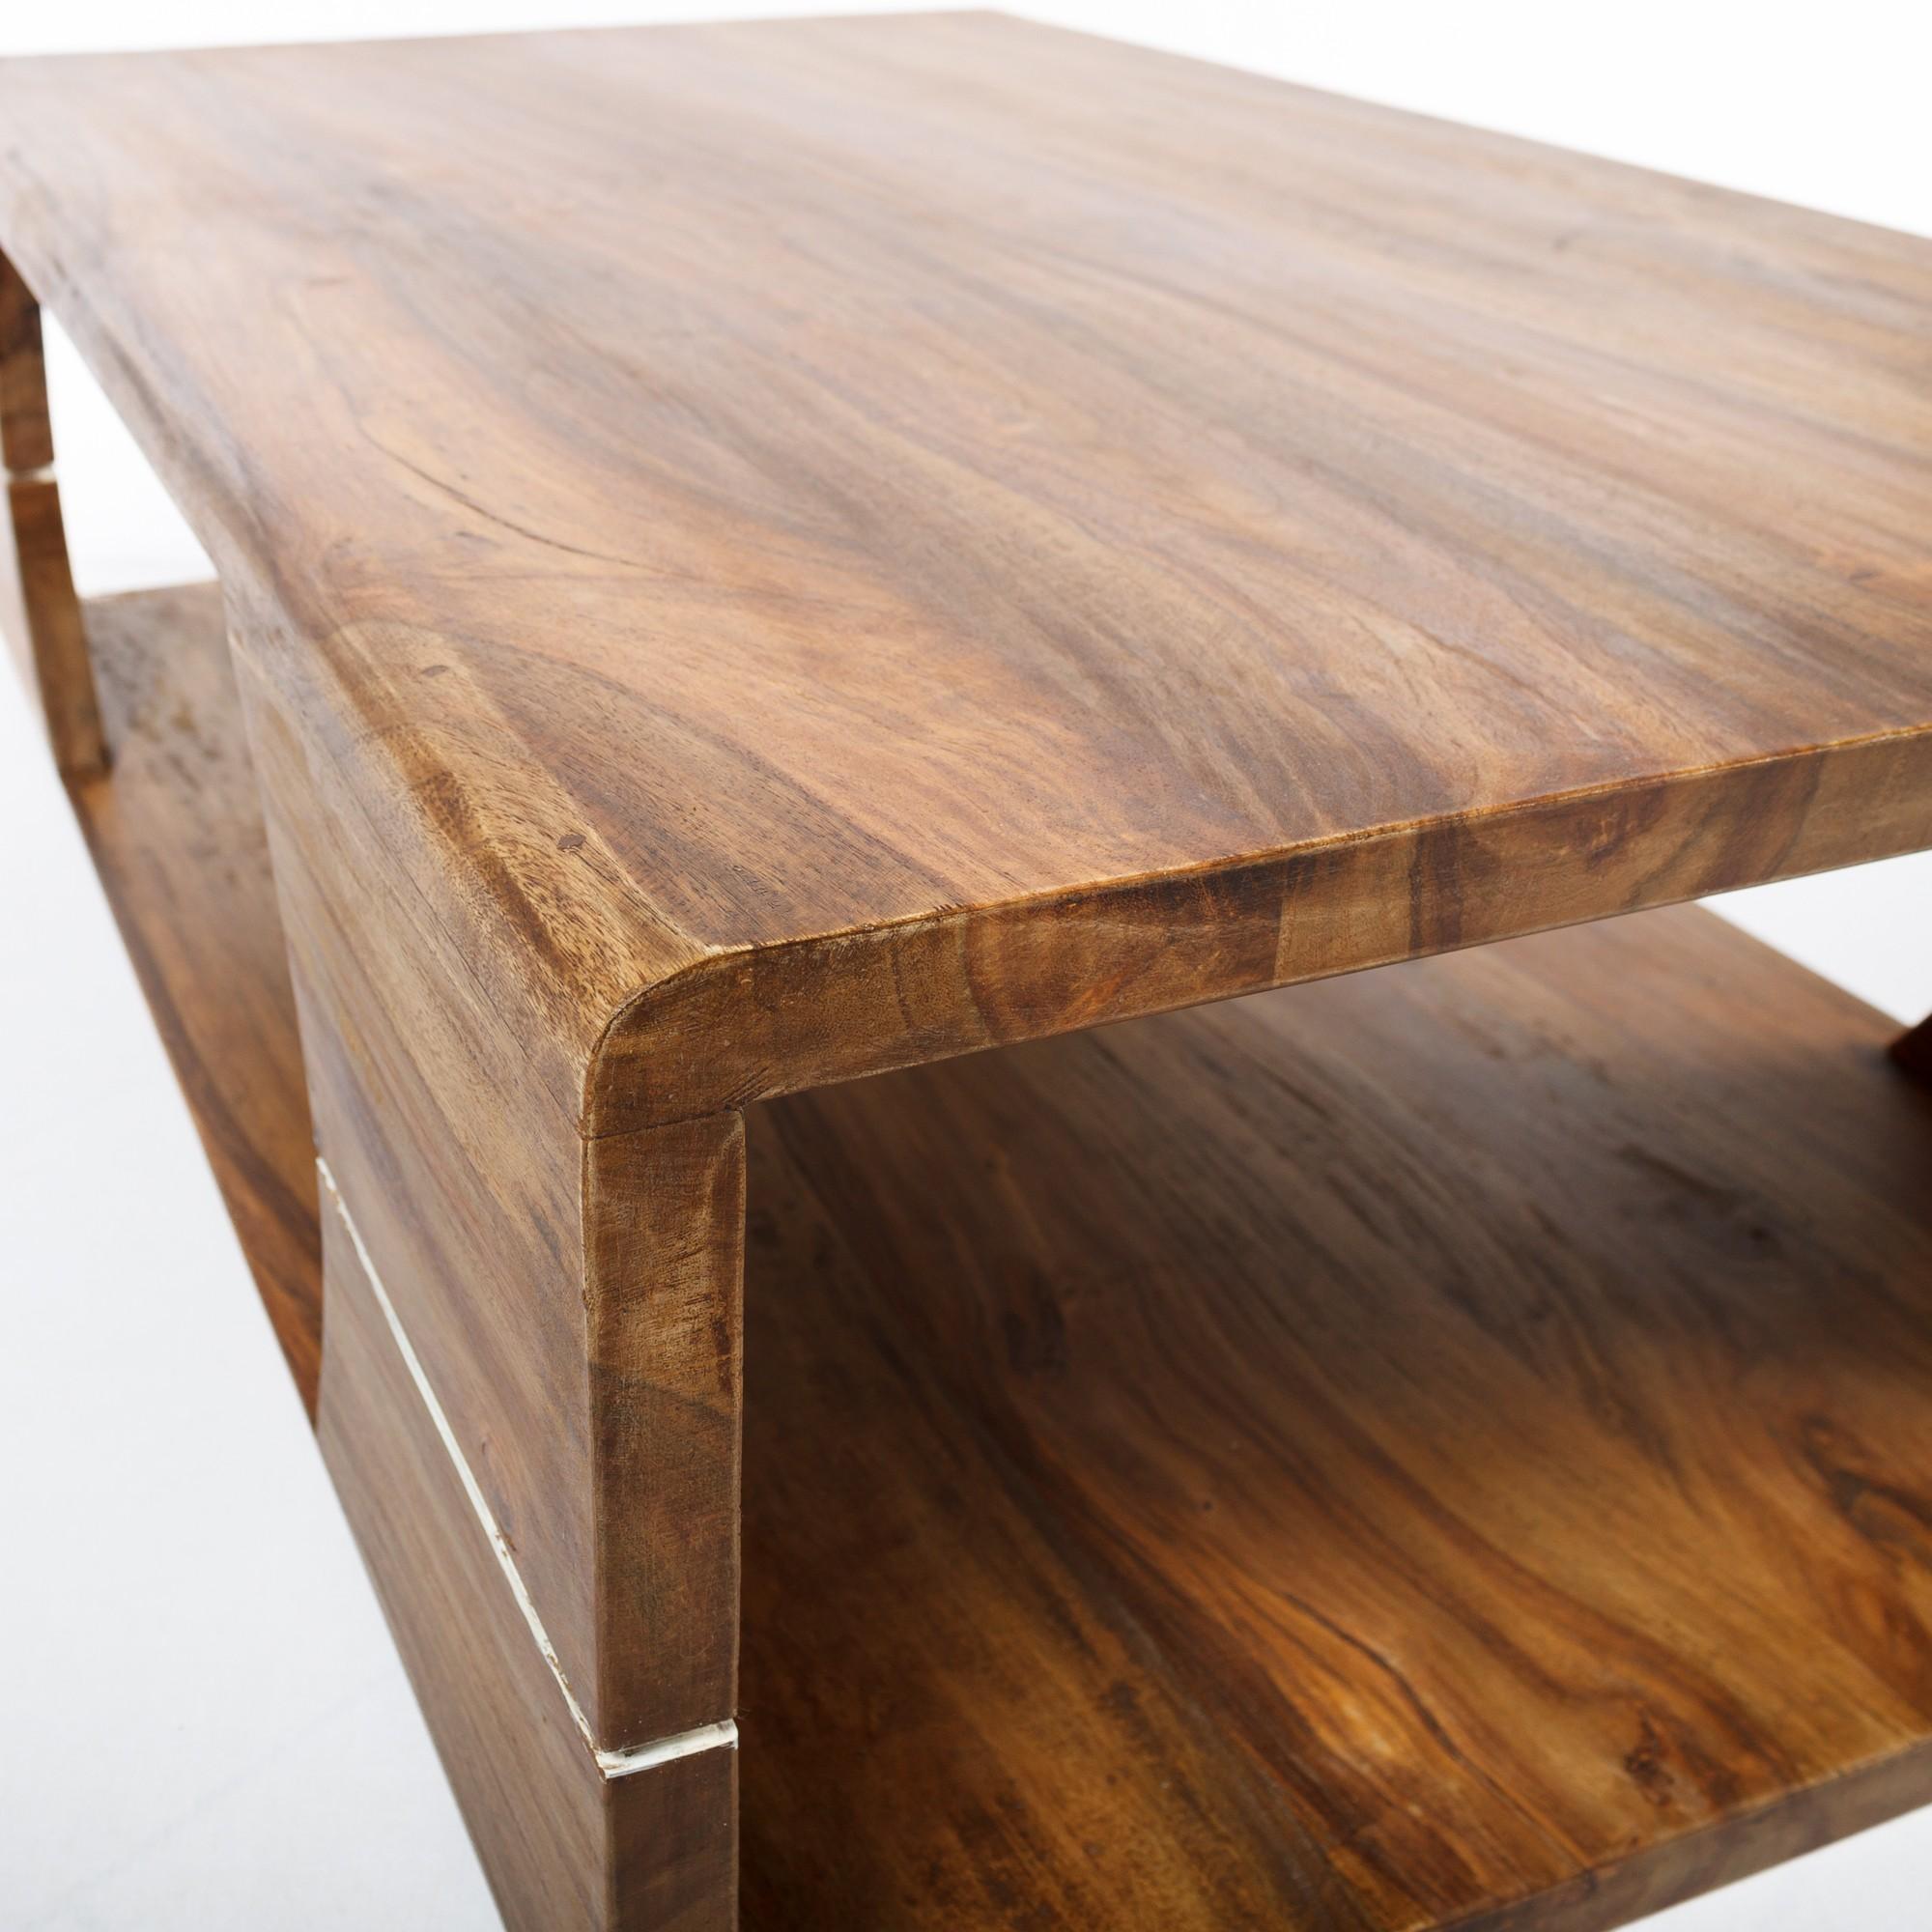 couchtisch palisander sheesham stone finish 100x60x30. Black Bedroom Furniture Sets. Home Design Ideas